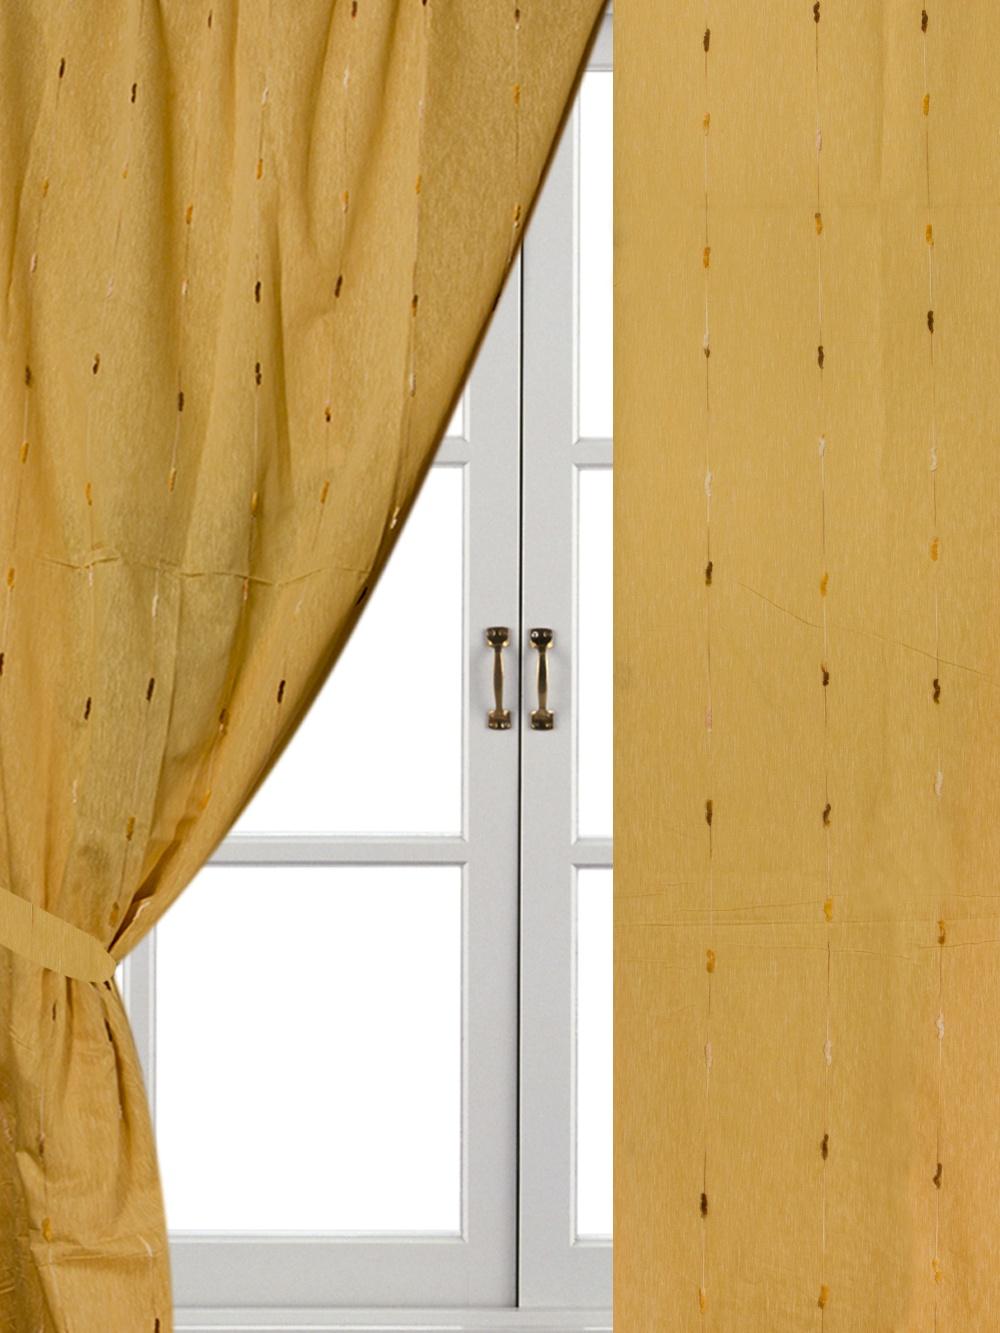 Шторы комнатные Айлант ОБ18 шторы homedeco нитяные шторы яркие кольца